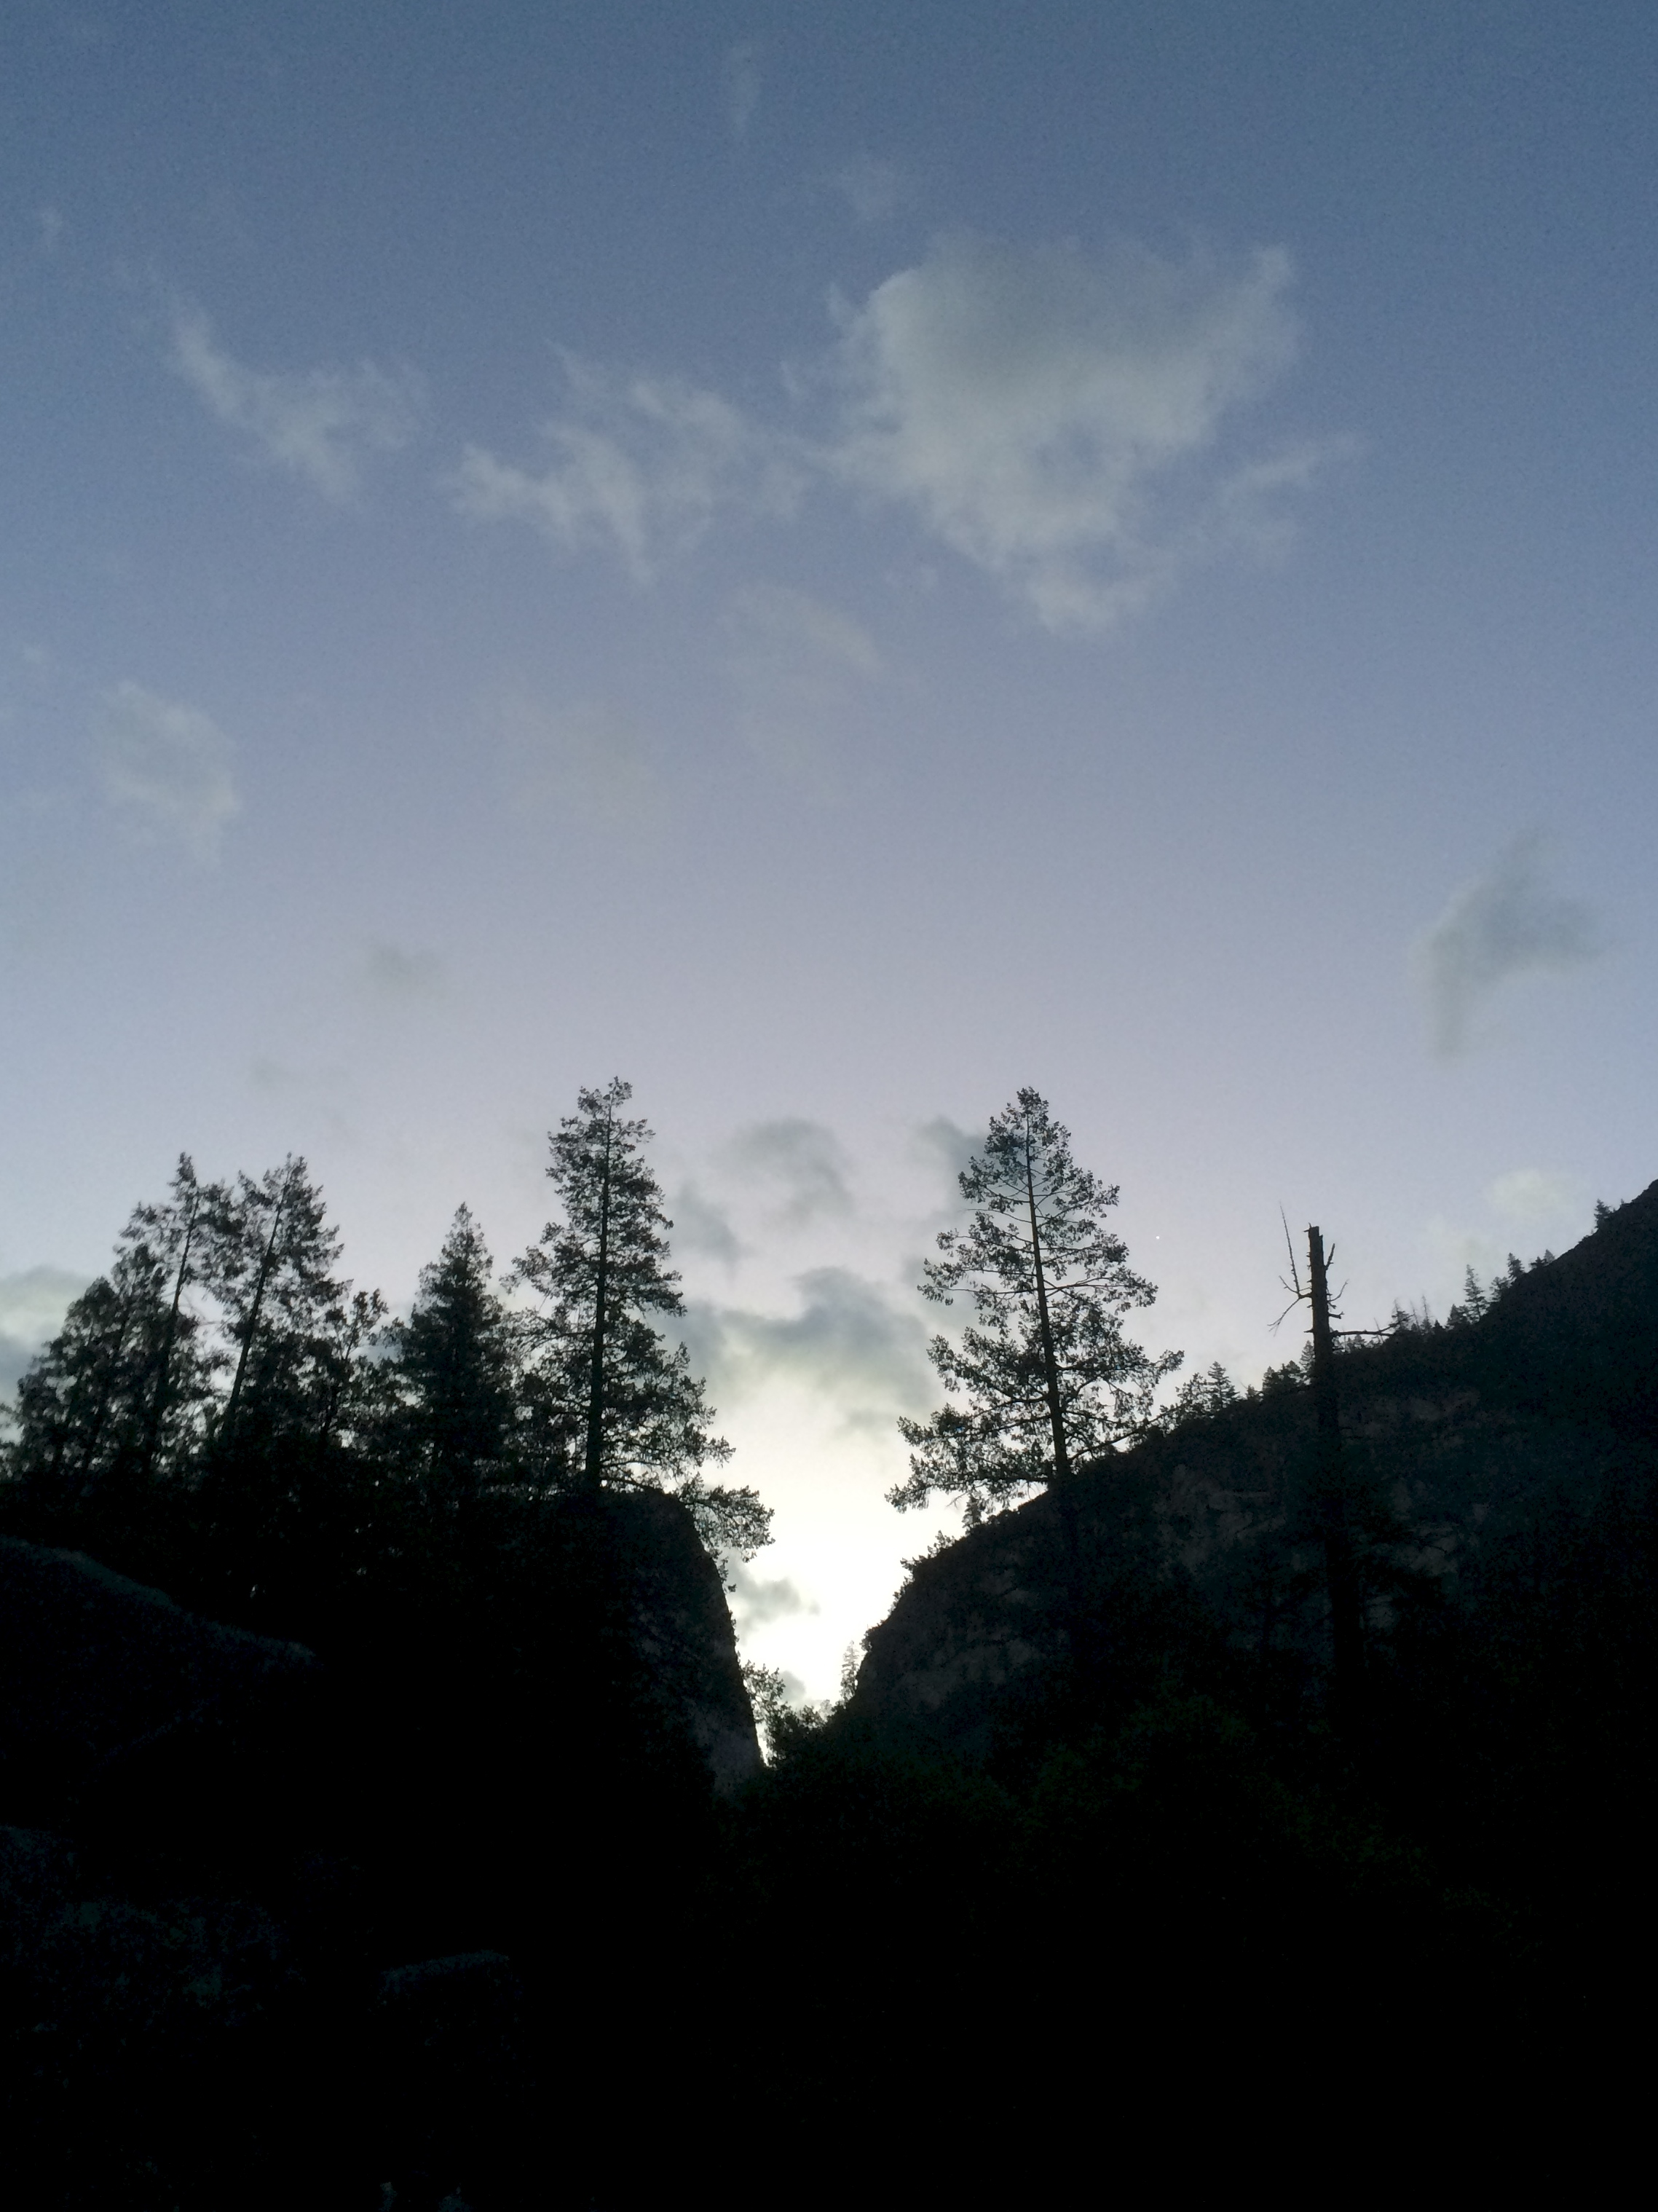 The grainily dawning dawn.